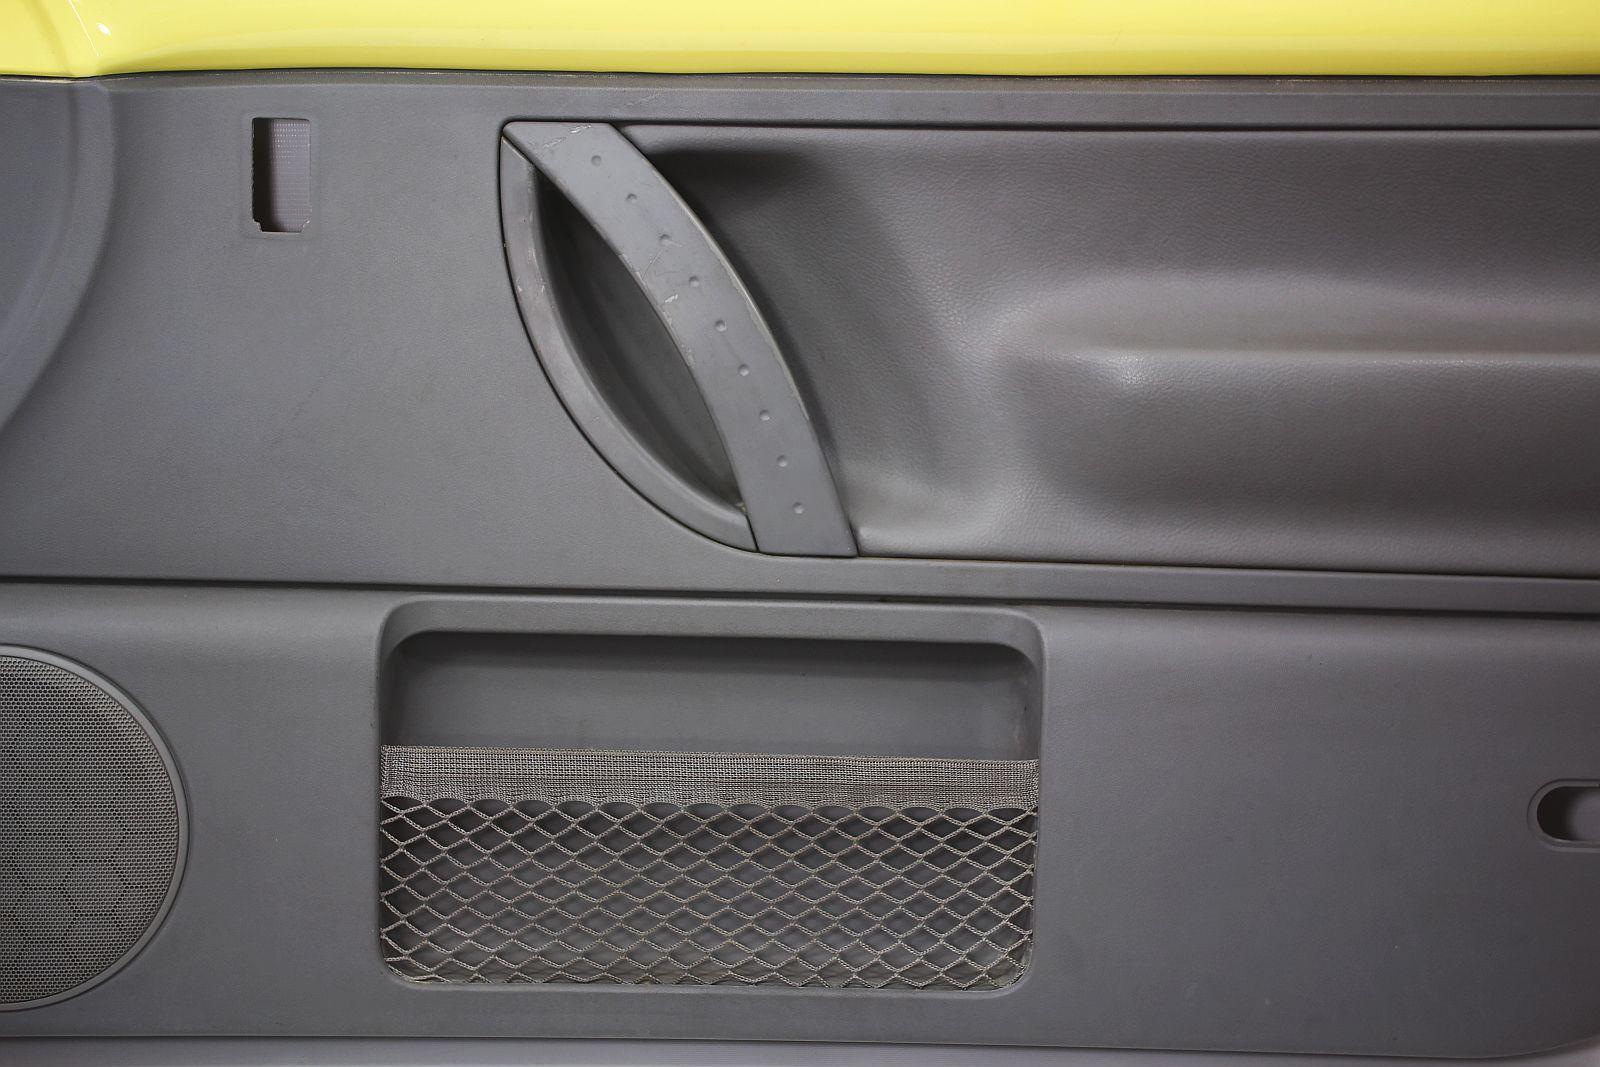 RH Front Door Panel 98 05 VW Beetle Interior Trim Yellow Gray Leather OE